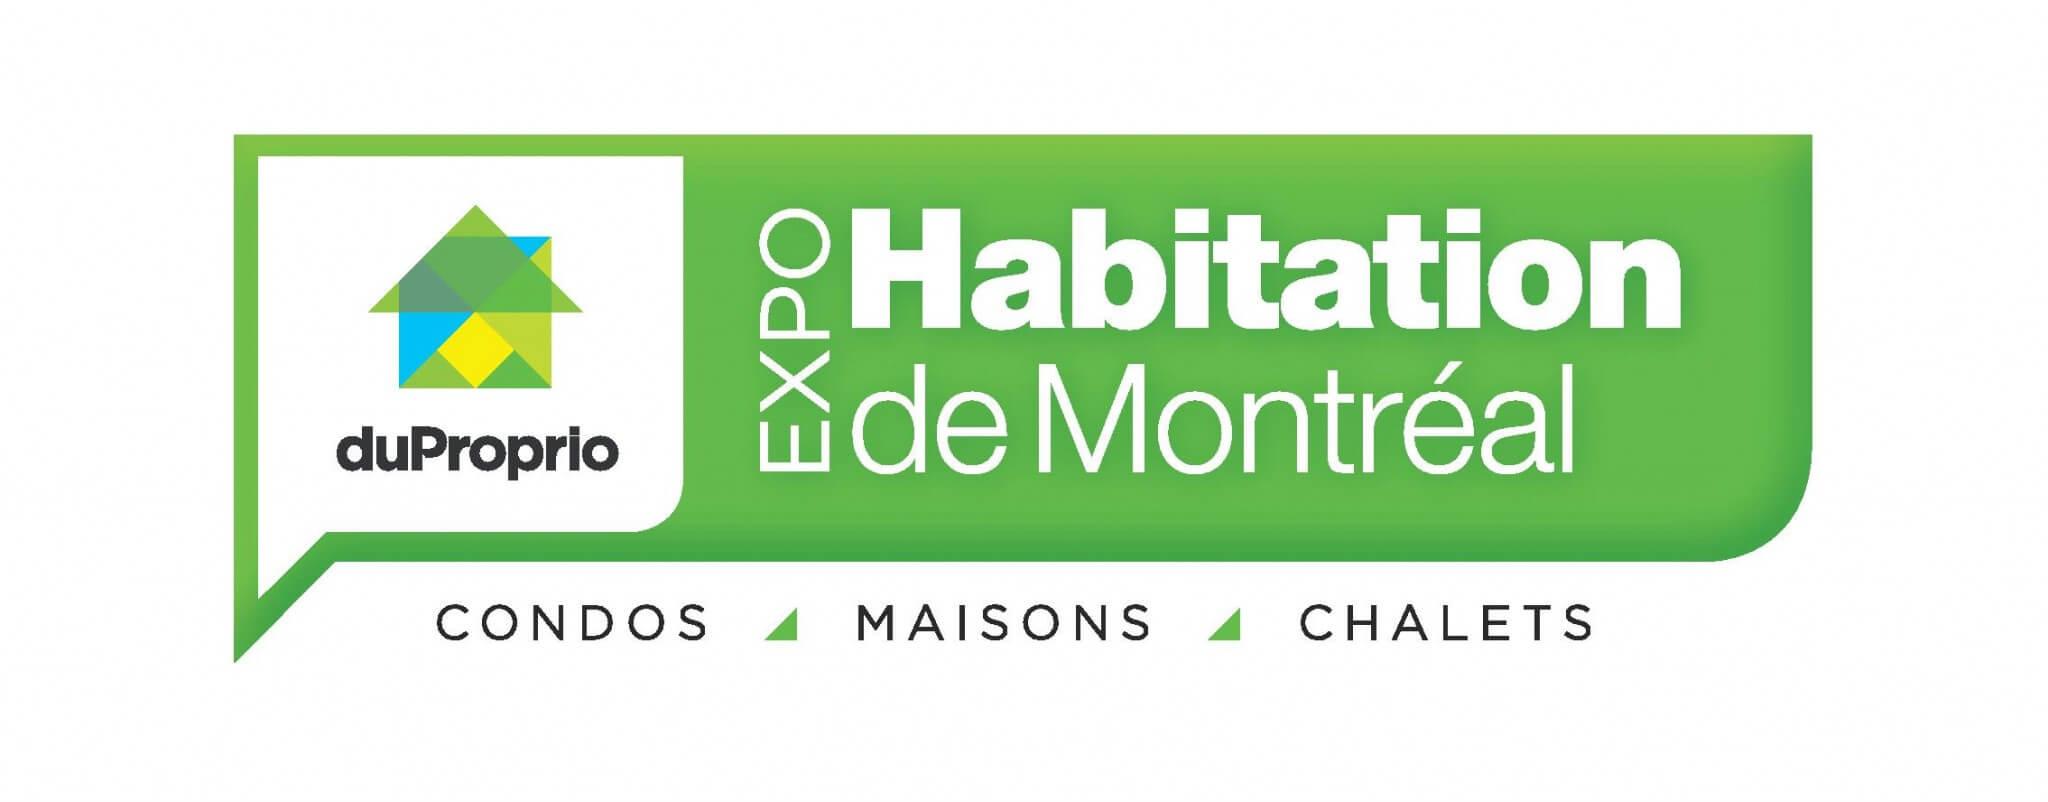 logo expo habitation de montreal